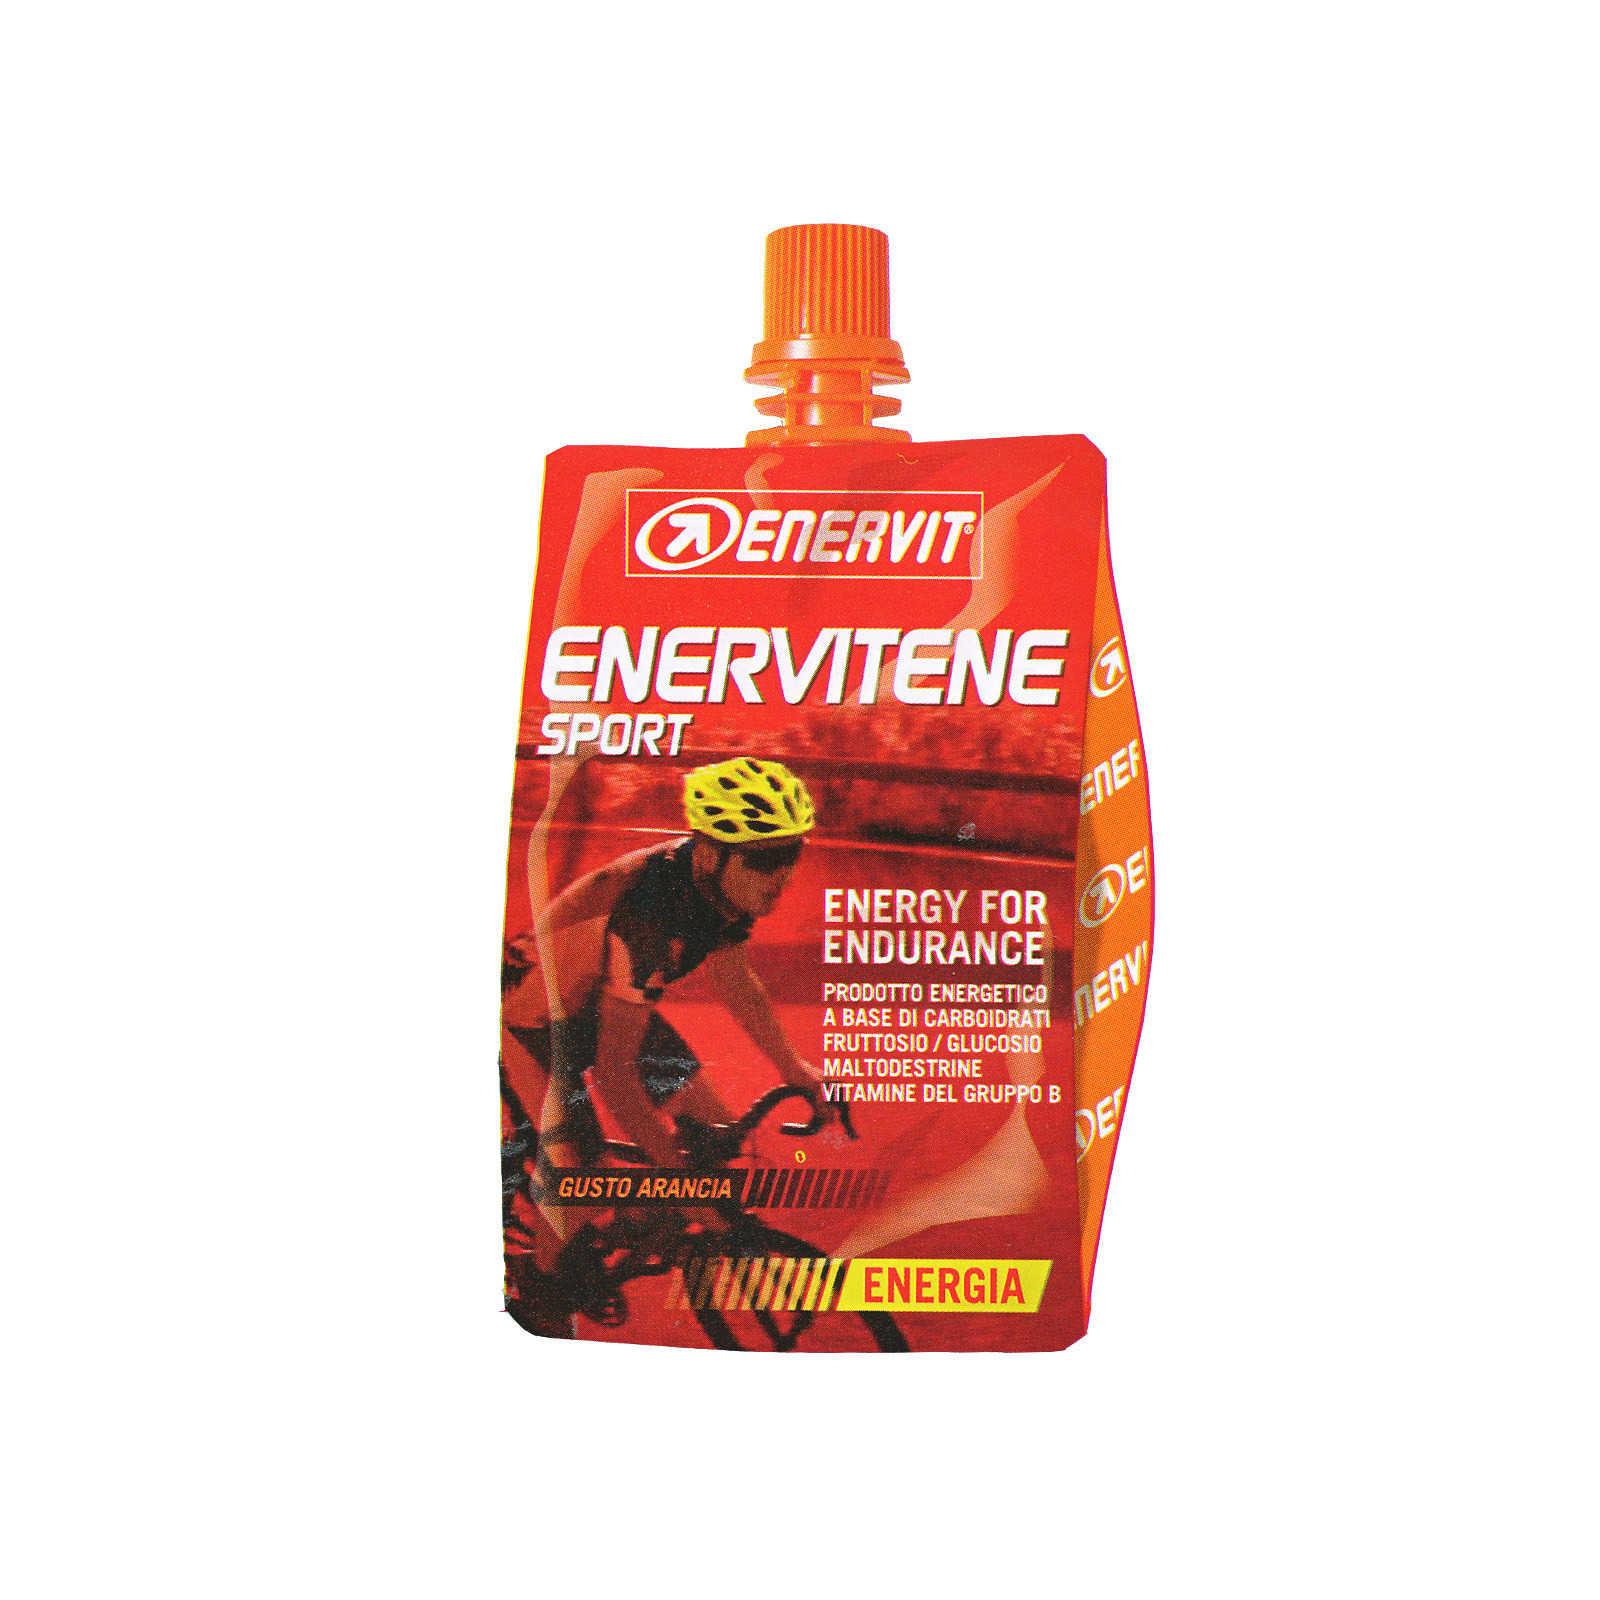 Enervit - Enervitene - Cheerpack Arancia